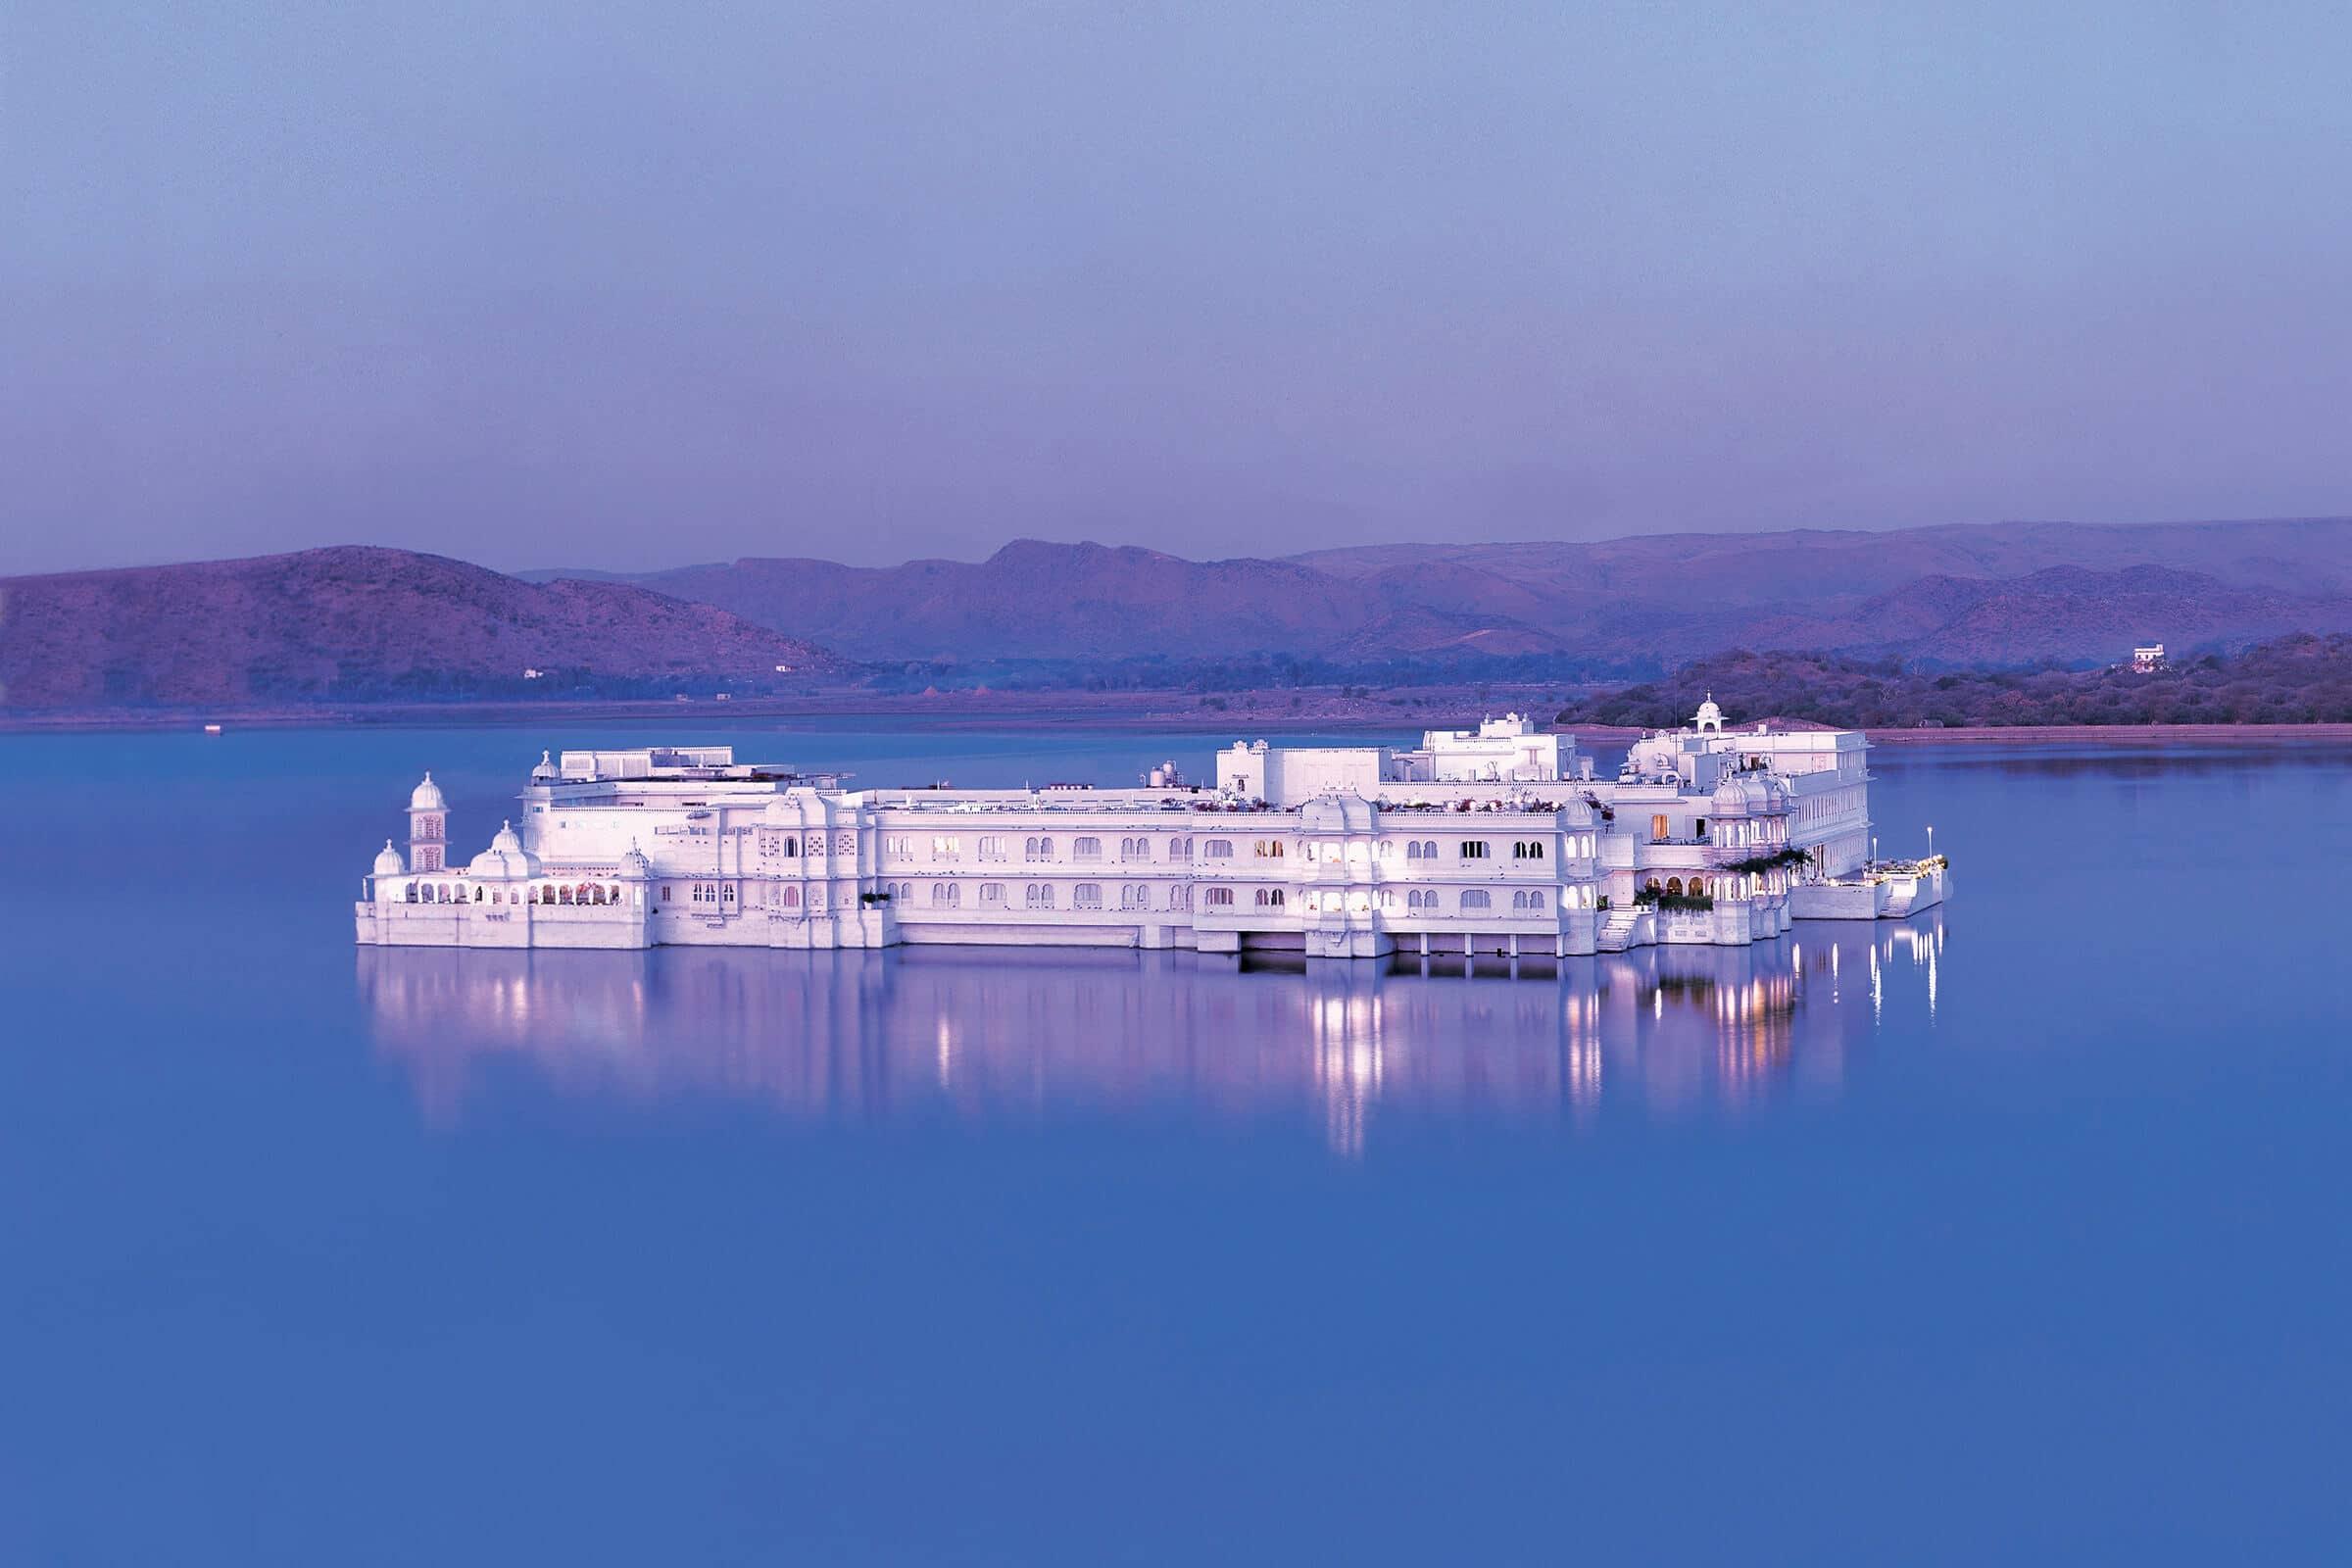 Lake Palace on fine dining Indian